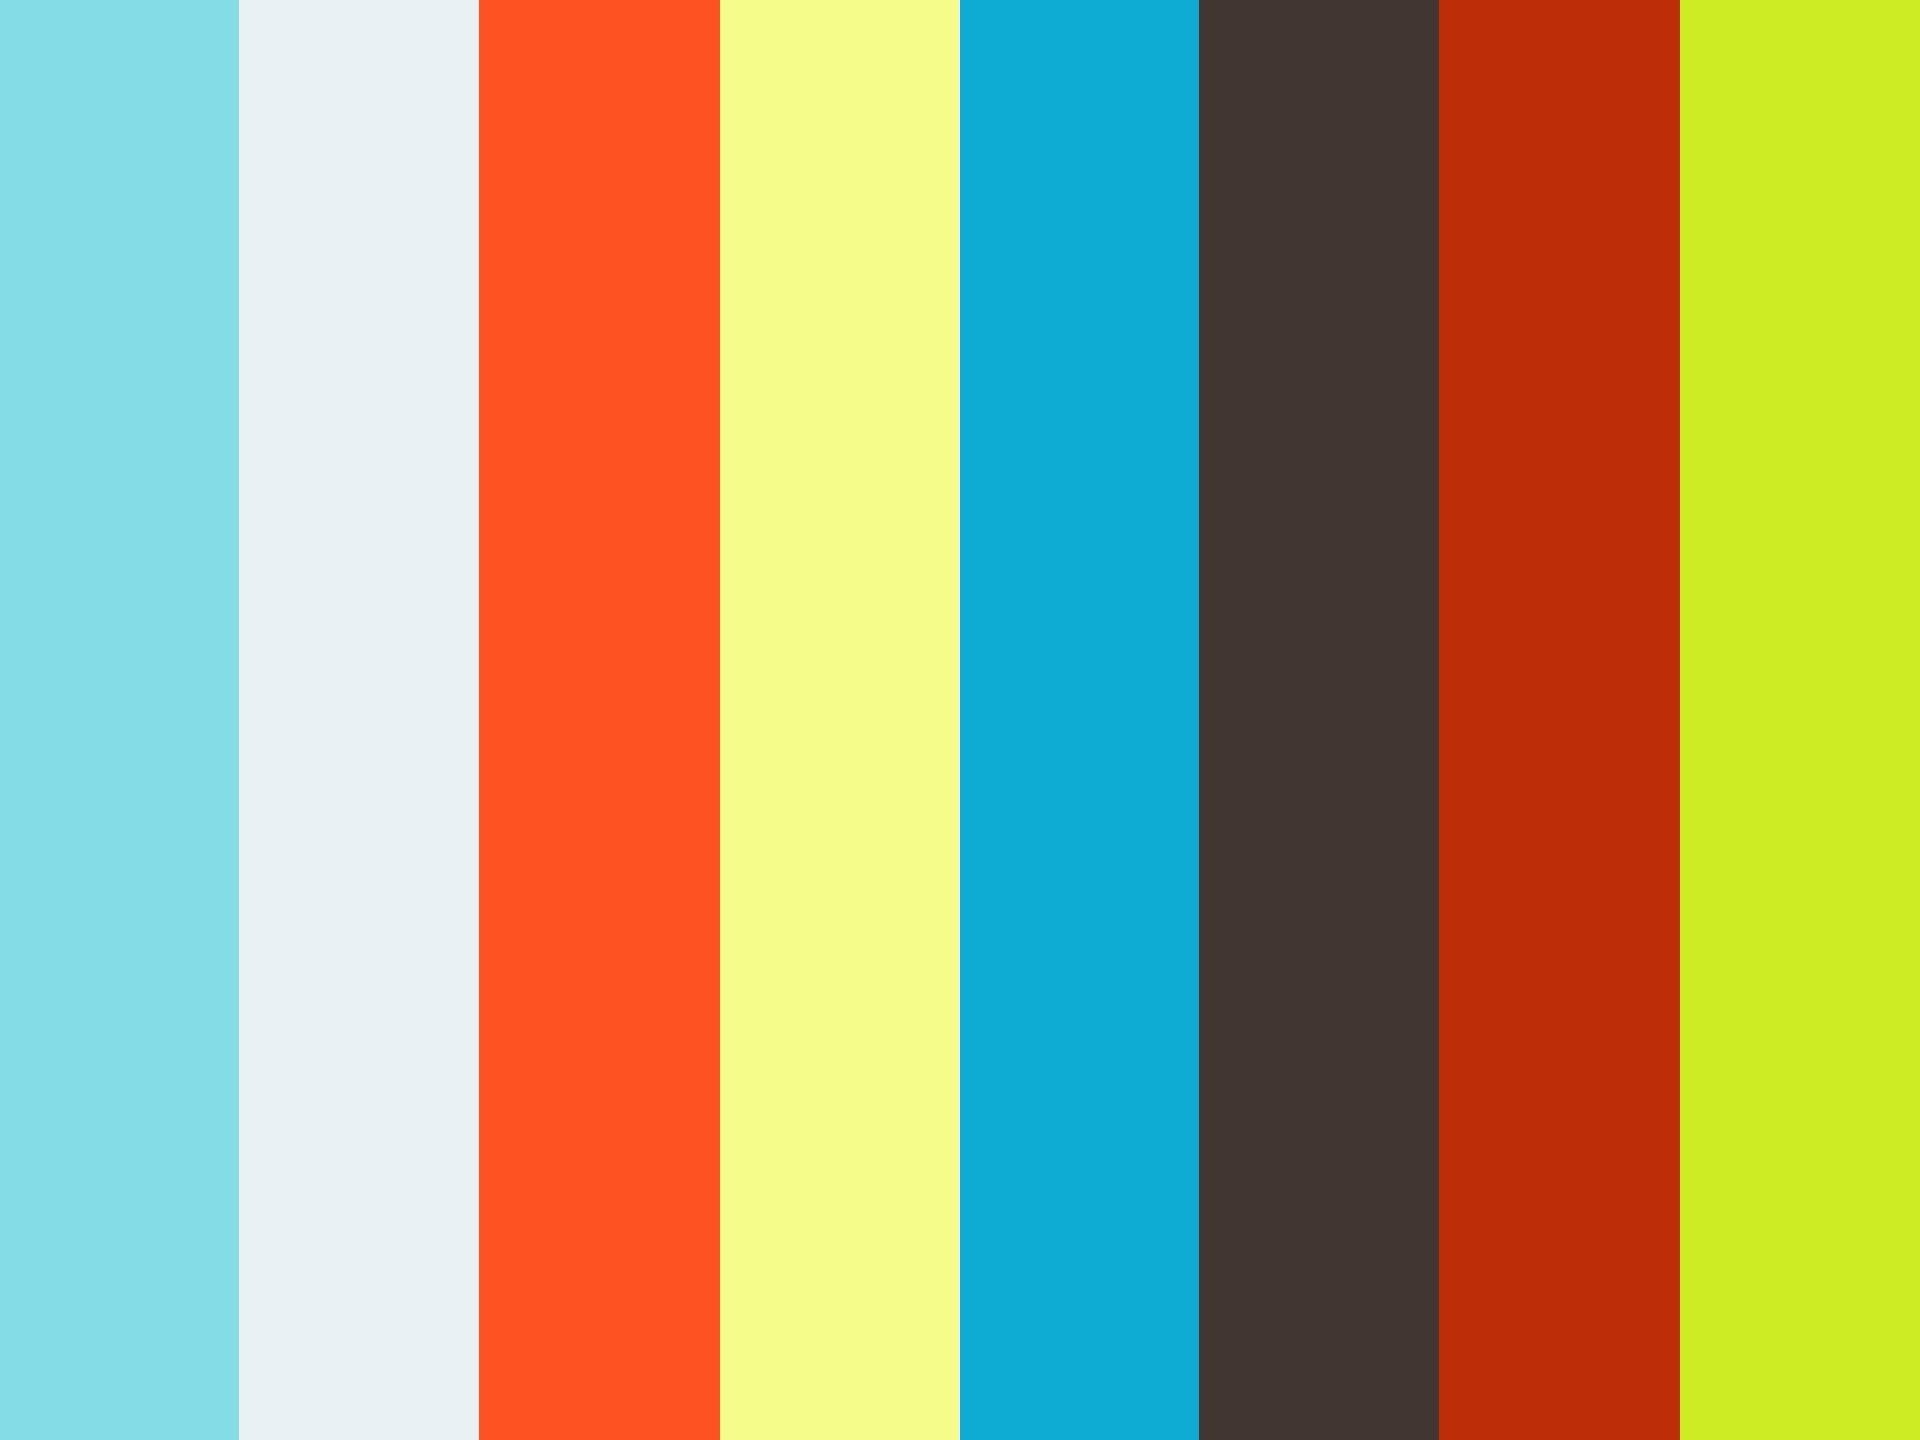 RAIT_IN_SE-B_EM-III_VHP_Complex Variables on Vimeo